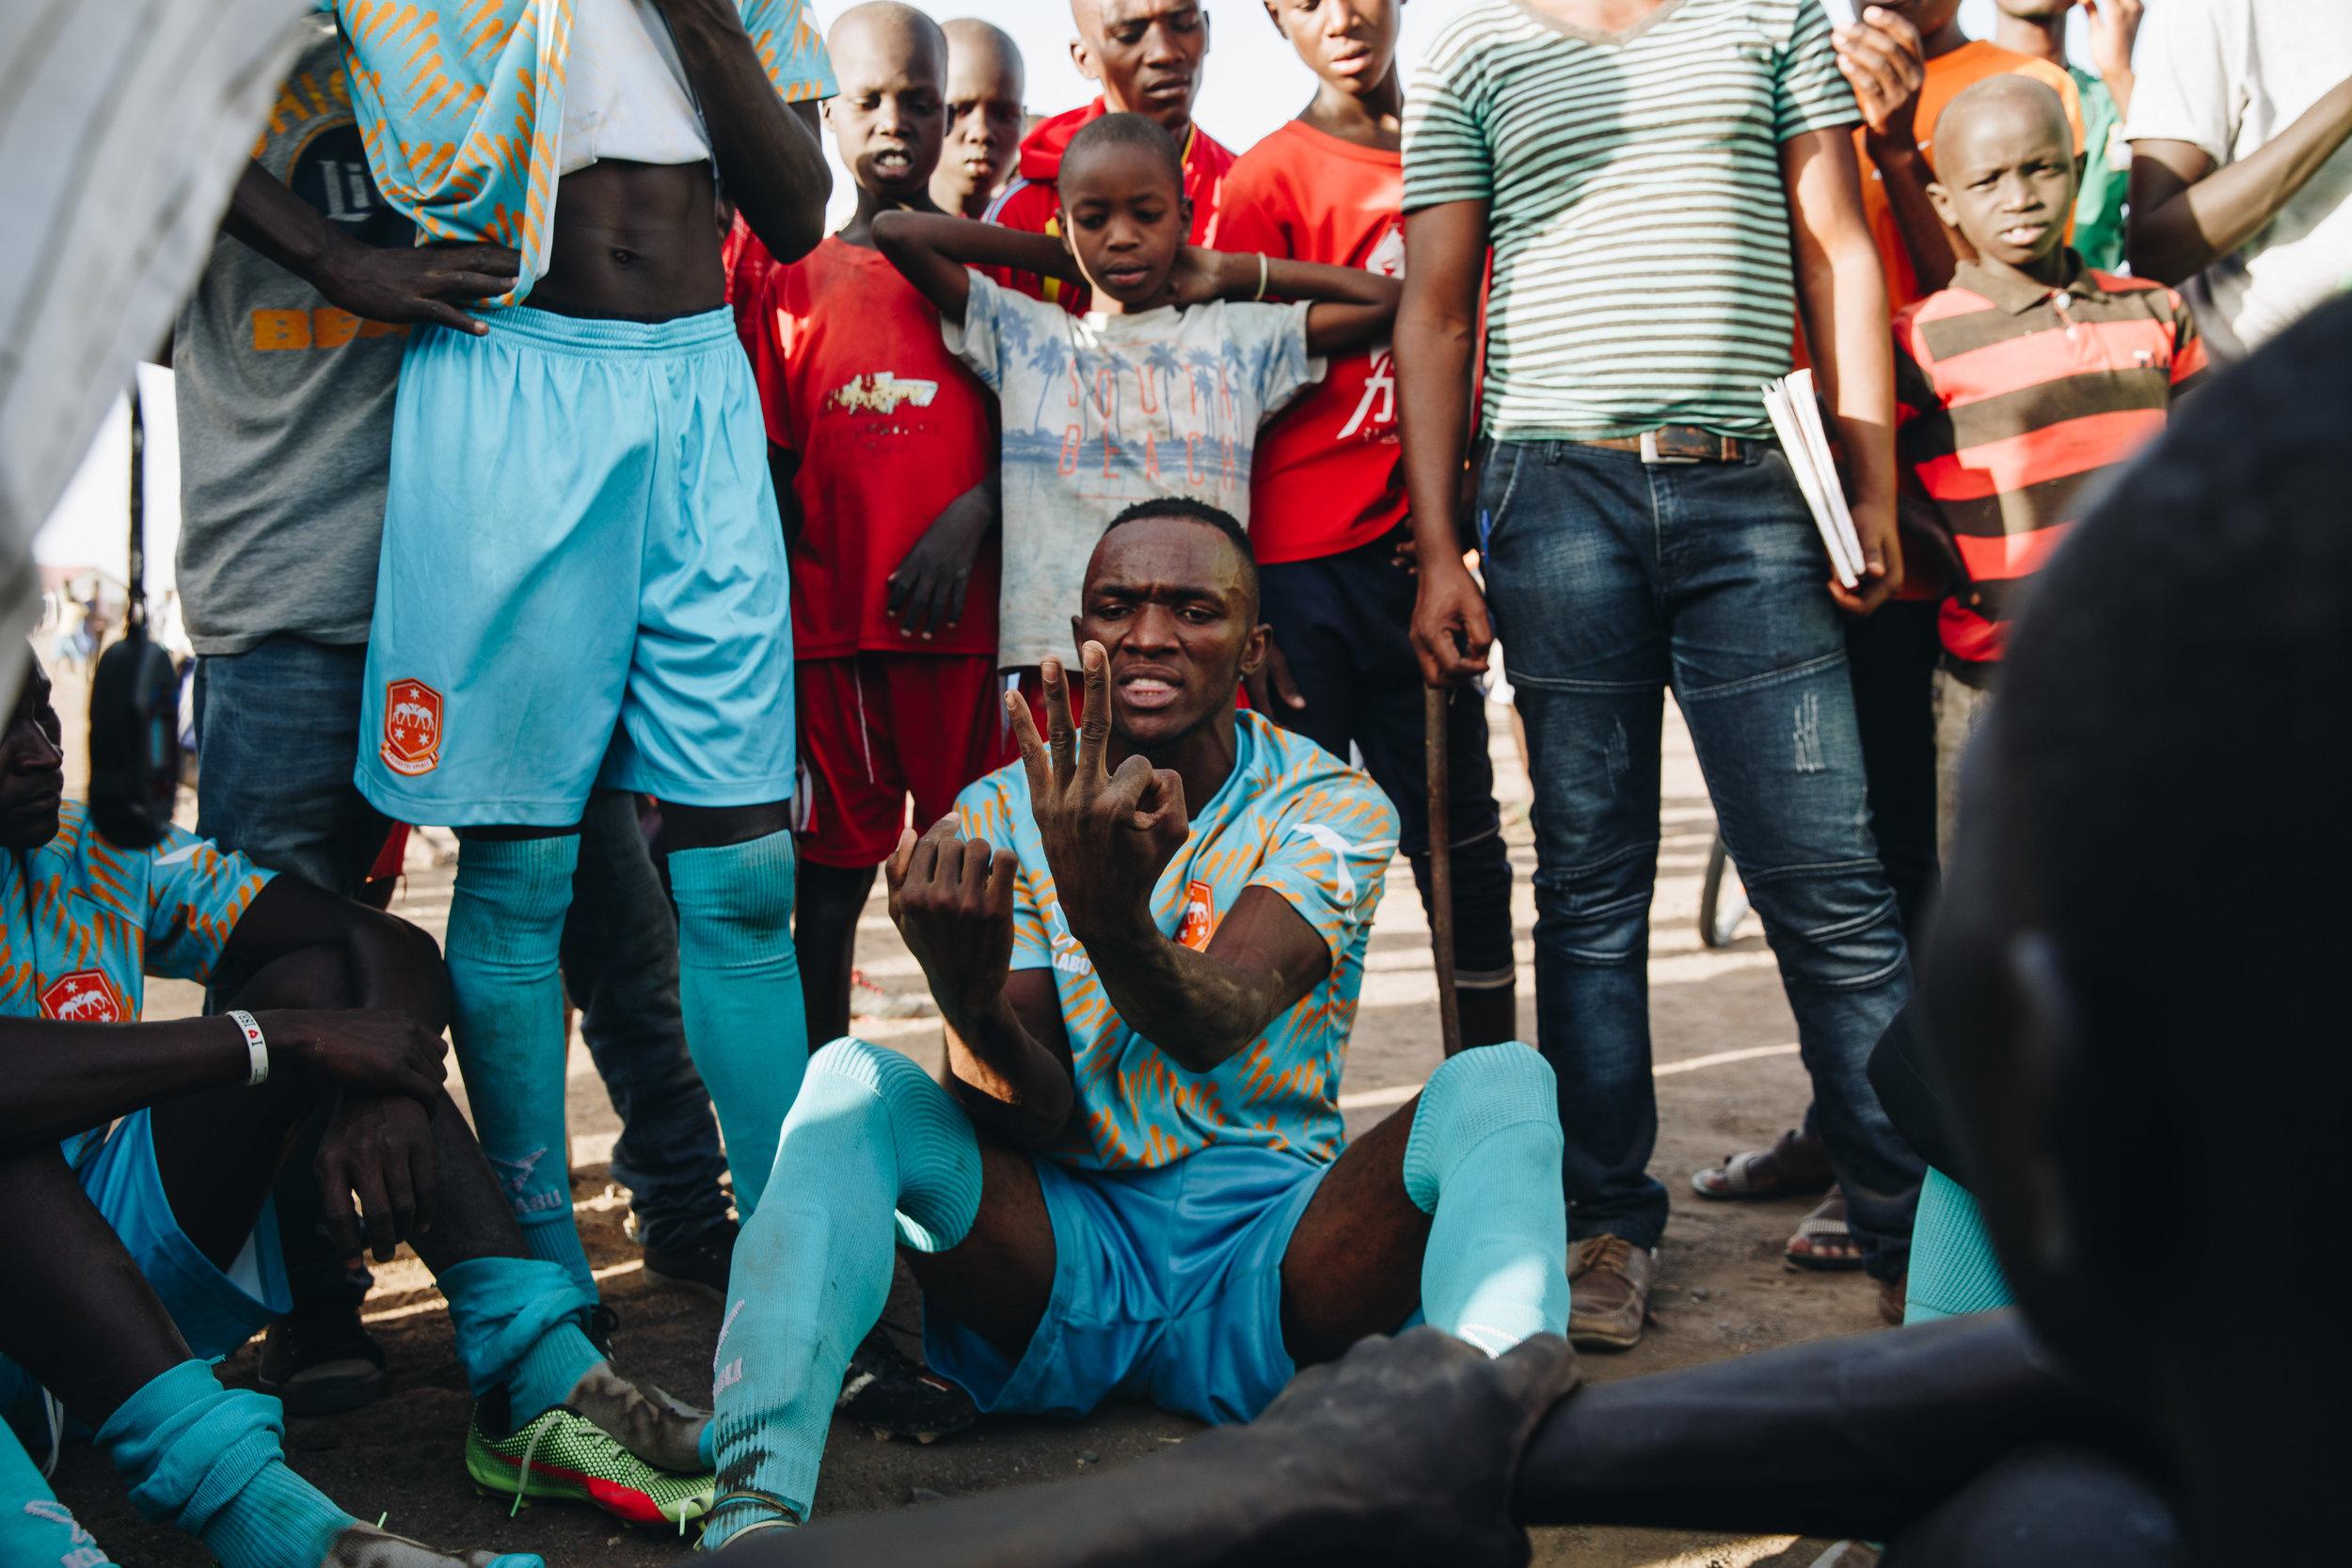 02_KLABU Campaign image _ by Coco Olakunle.jpg